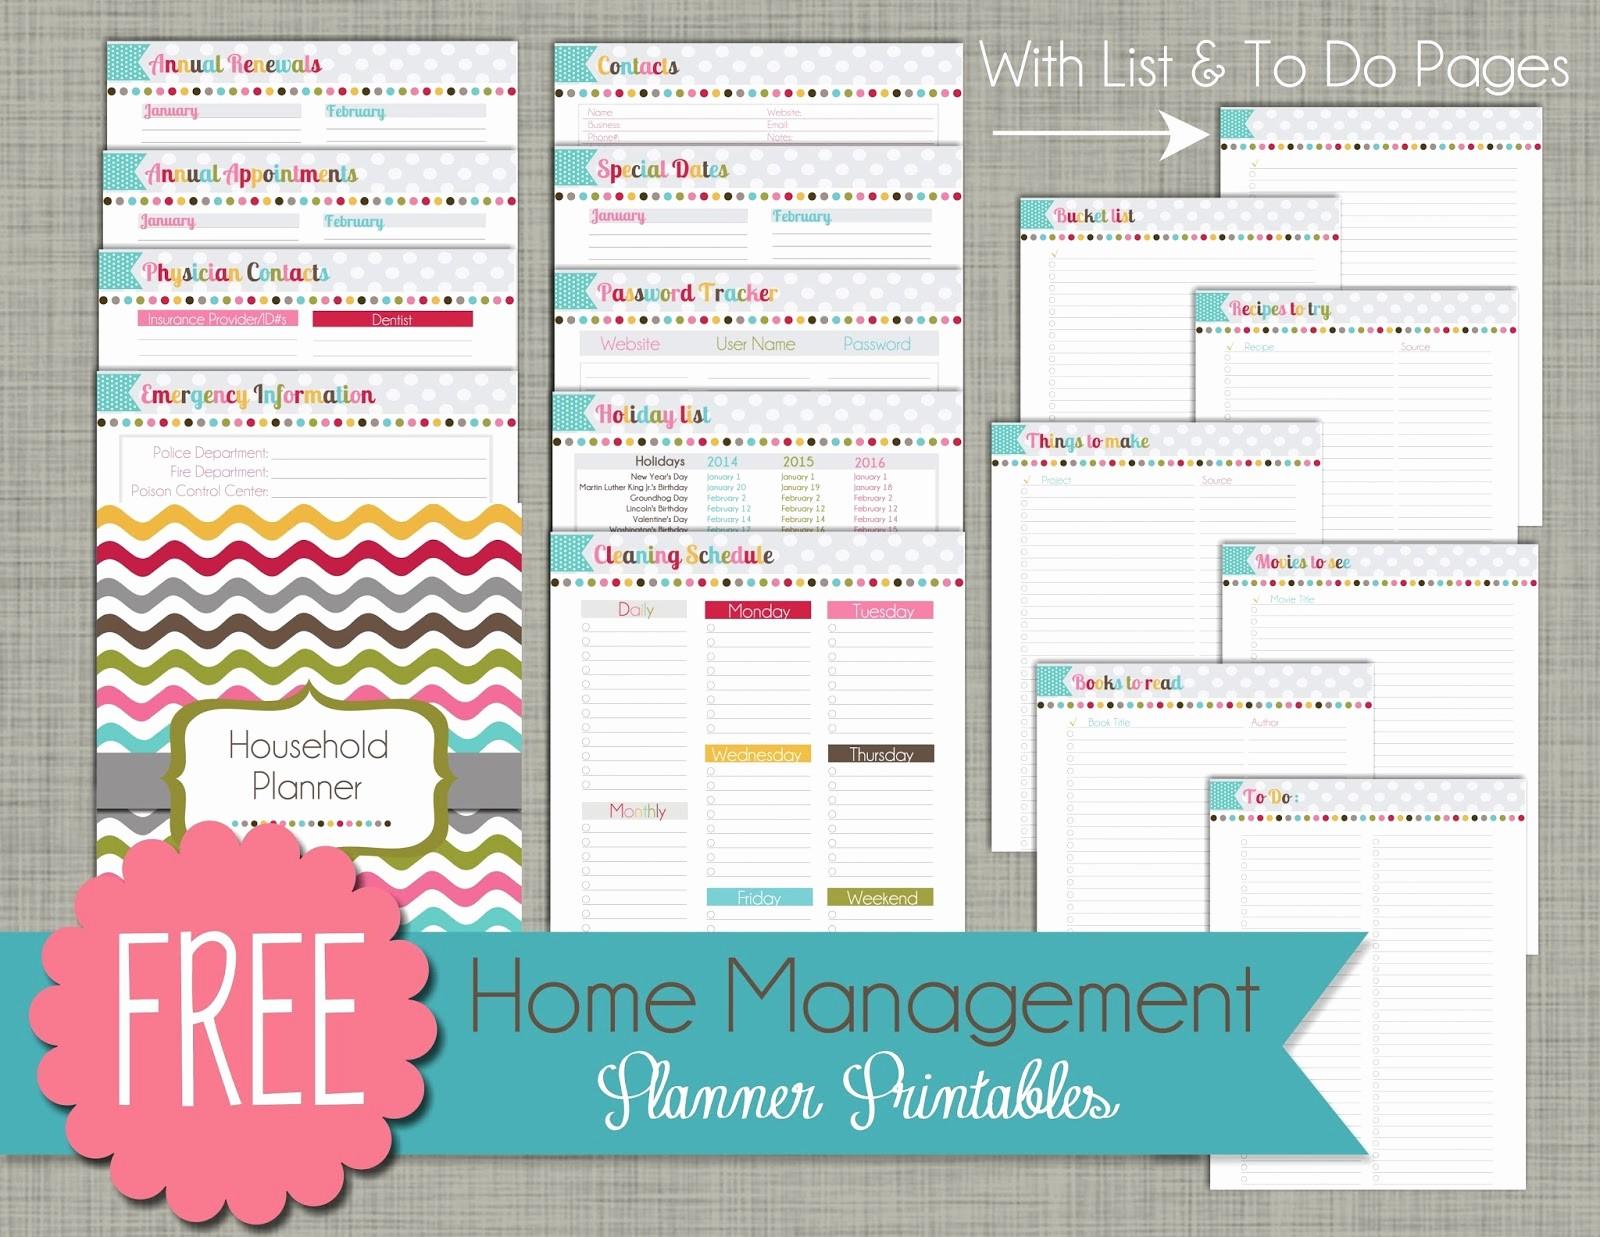 Free Printable Daily Calendar 2015 Best Of 5 Best Of Free 8 X 11 Printable Weekly Planners